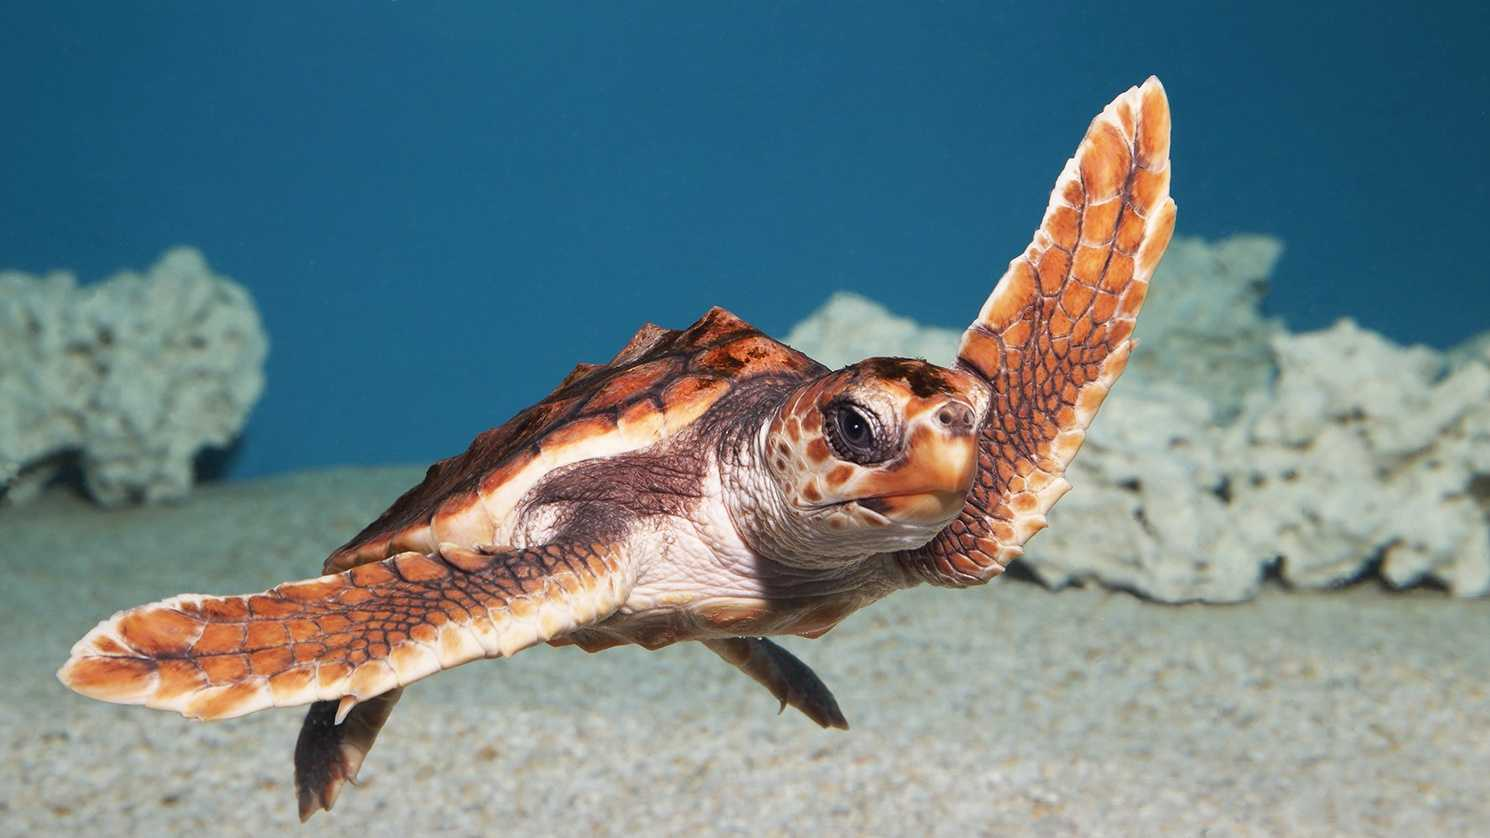 Photo byMonterey Bay Aquarium / Randy Wilder